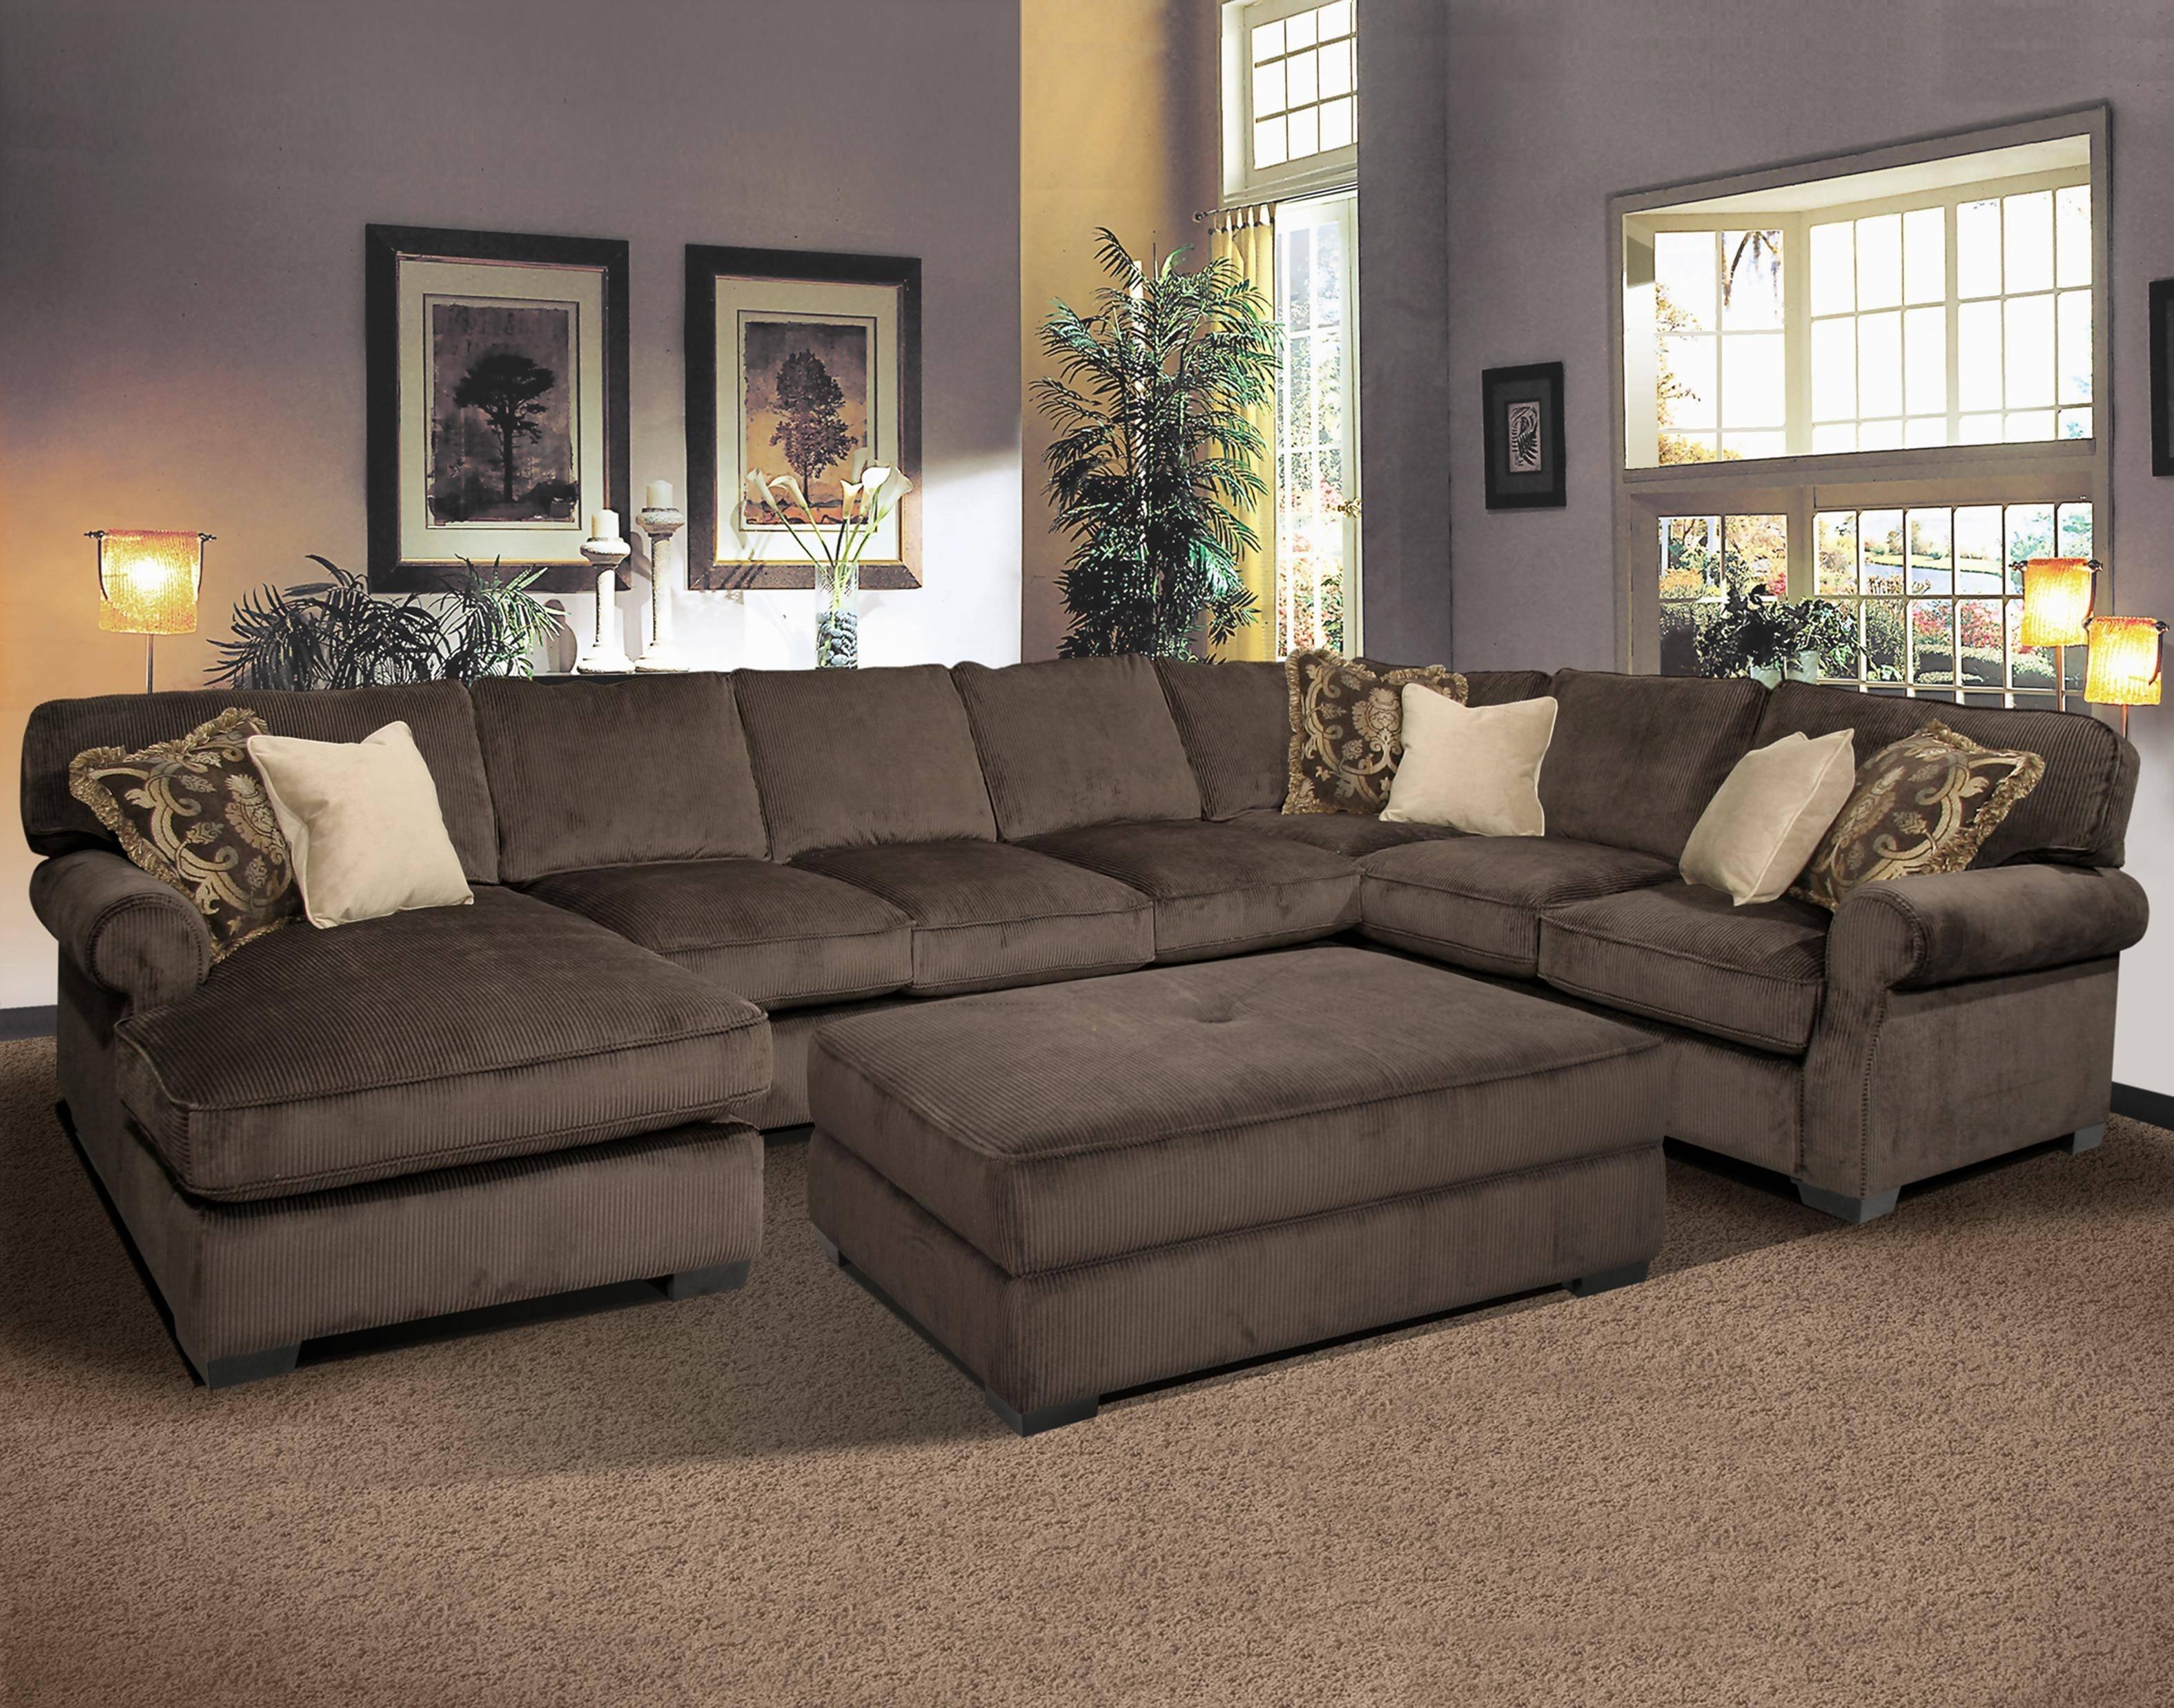 Sectional Sofas Austin Couches Texas Tx Leather Sofa Cheap Sleeper Throughout Sectional Sofas At Austin (View 3 of 10)